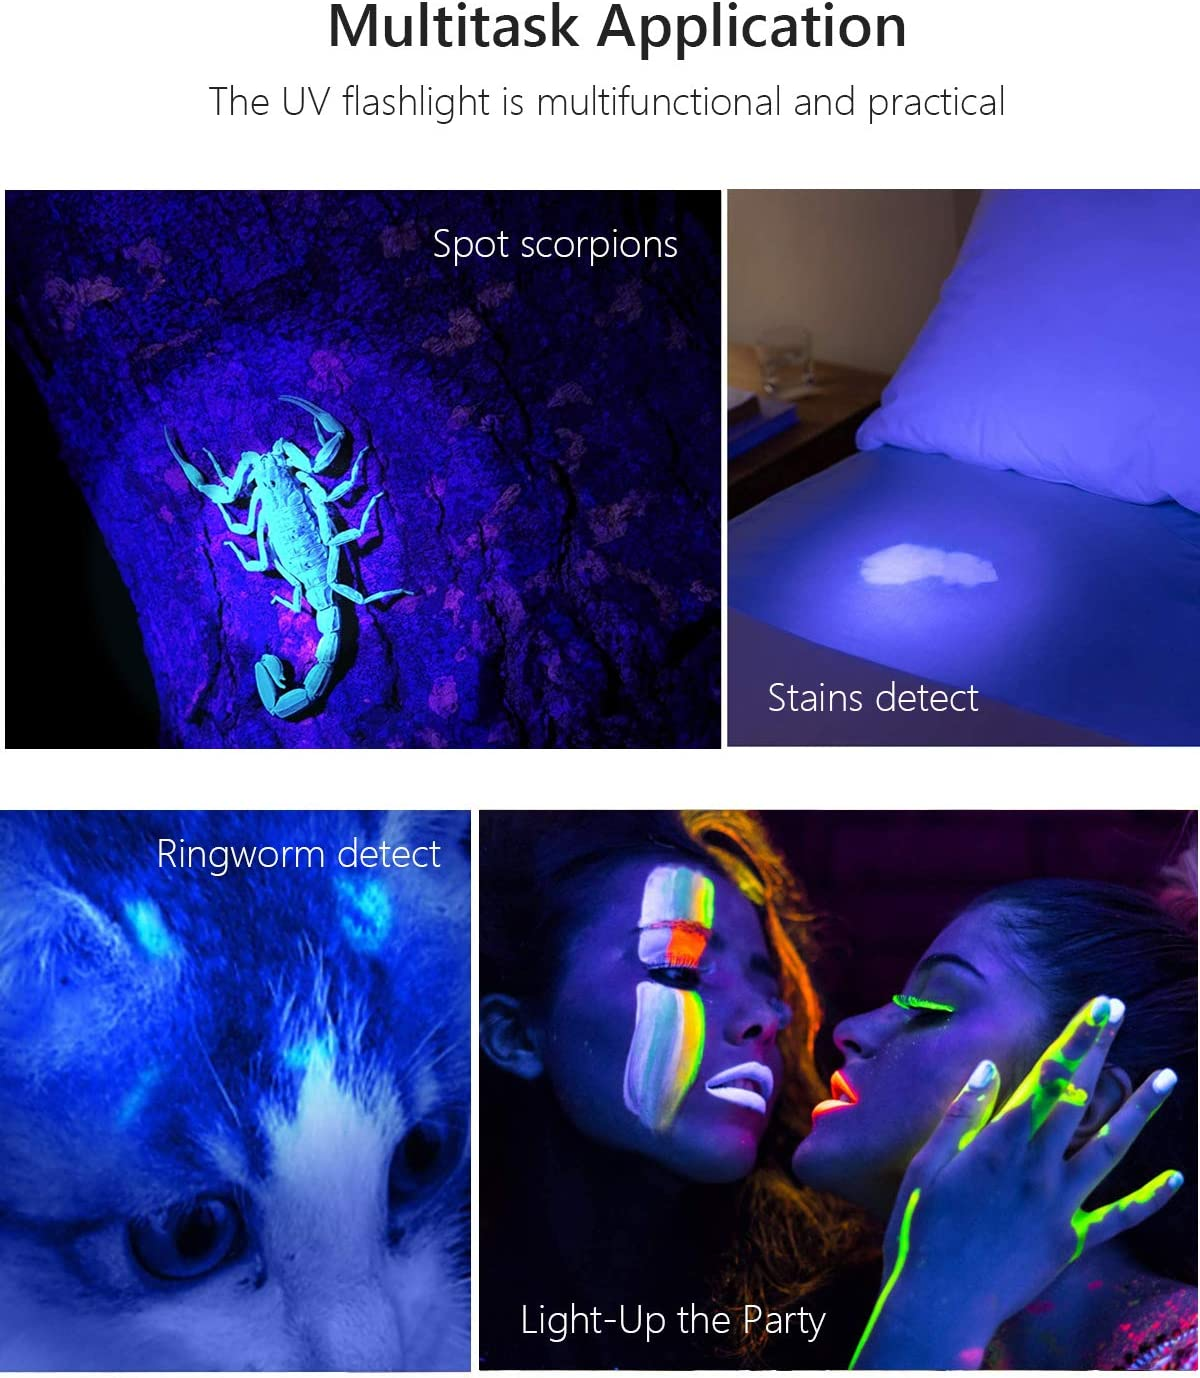 MXLEGNT UV Black Light Flashlight 2 Pack, LED UV Torch Mini Blacklight Ultraviolet Pen Lights for Leak and Hotel Inspection - Pet Urine, Bed Bug, Scorpion, Stain, and Dye Detector: Pet Supplies